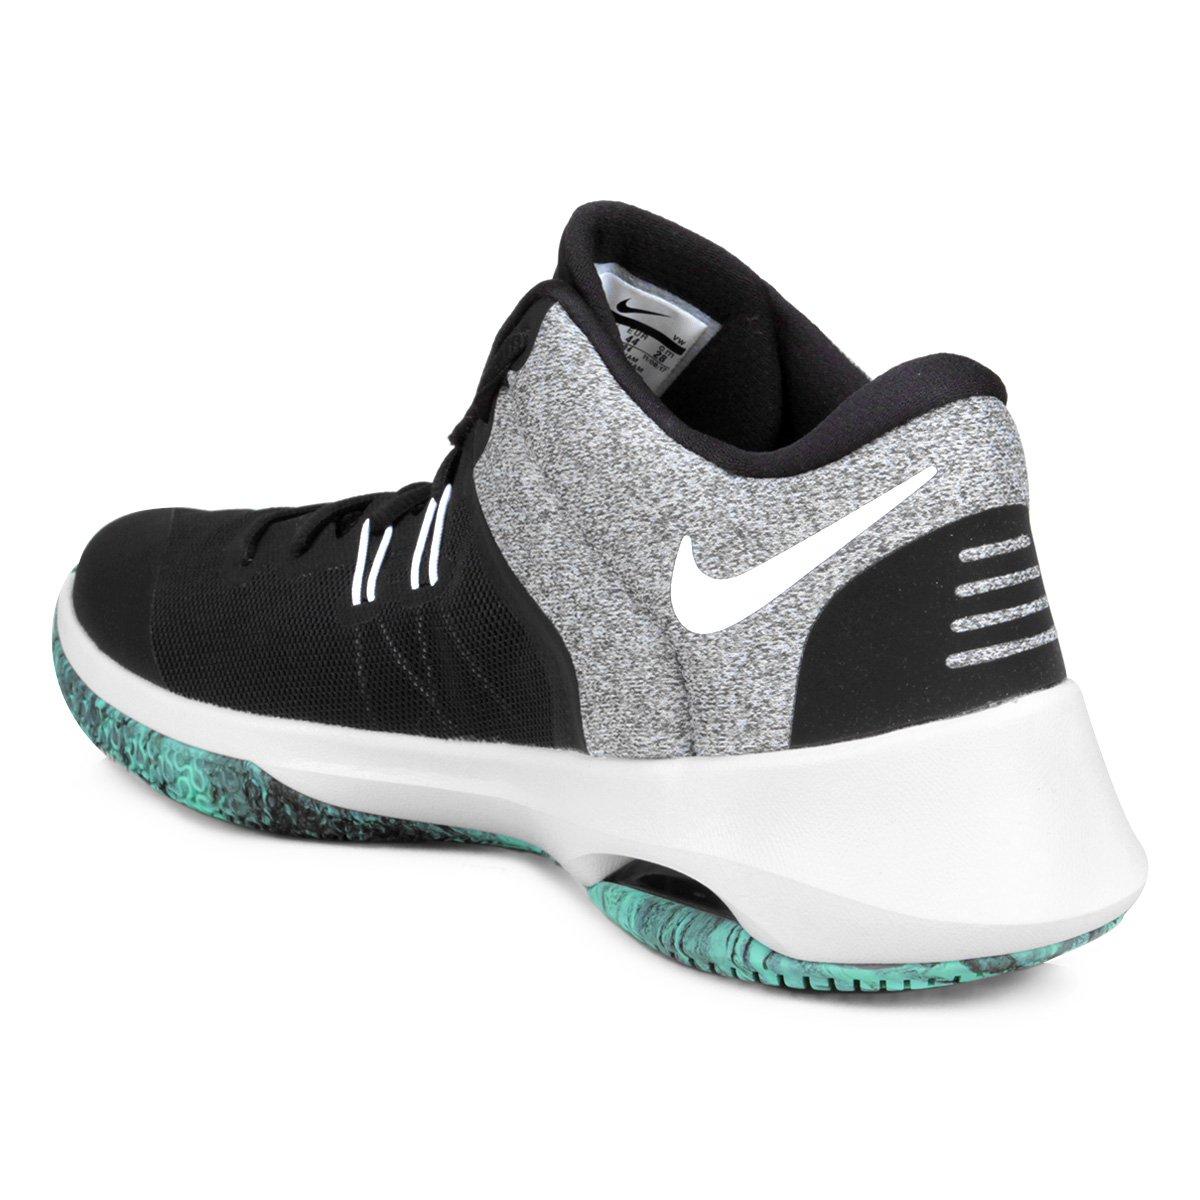 Tênis Nike Air Versitile II Masculino - Marinho e Cinza - Compre ... 329fd0b34666b